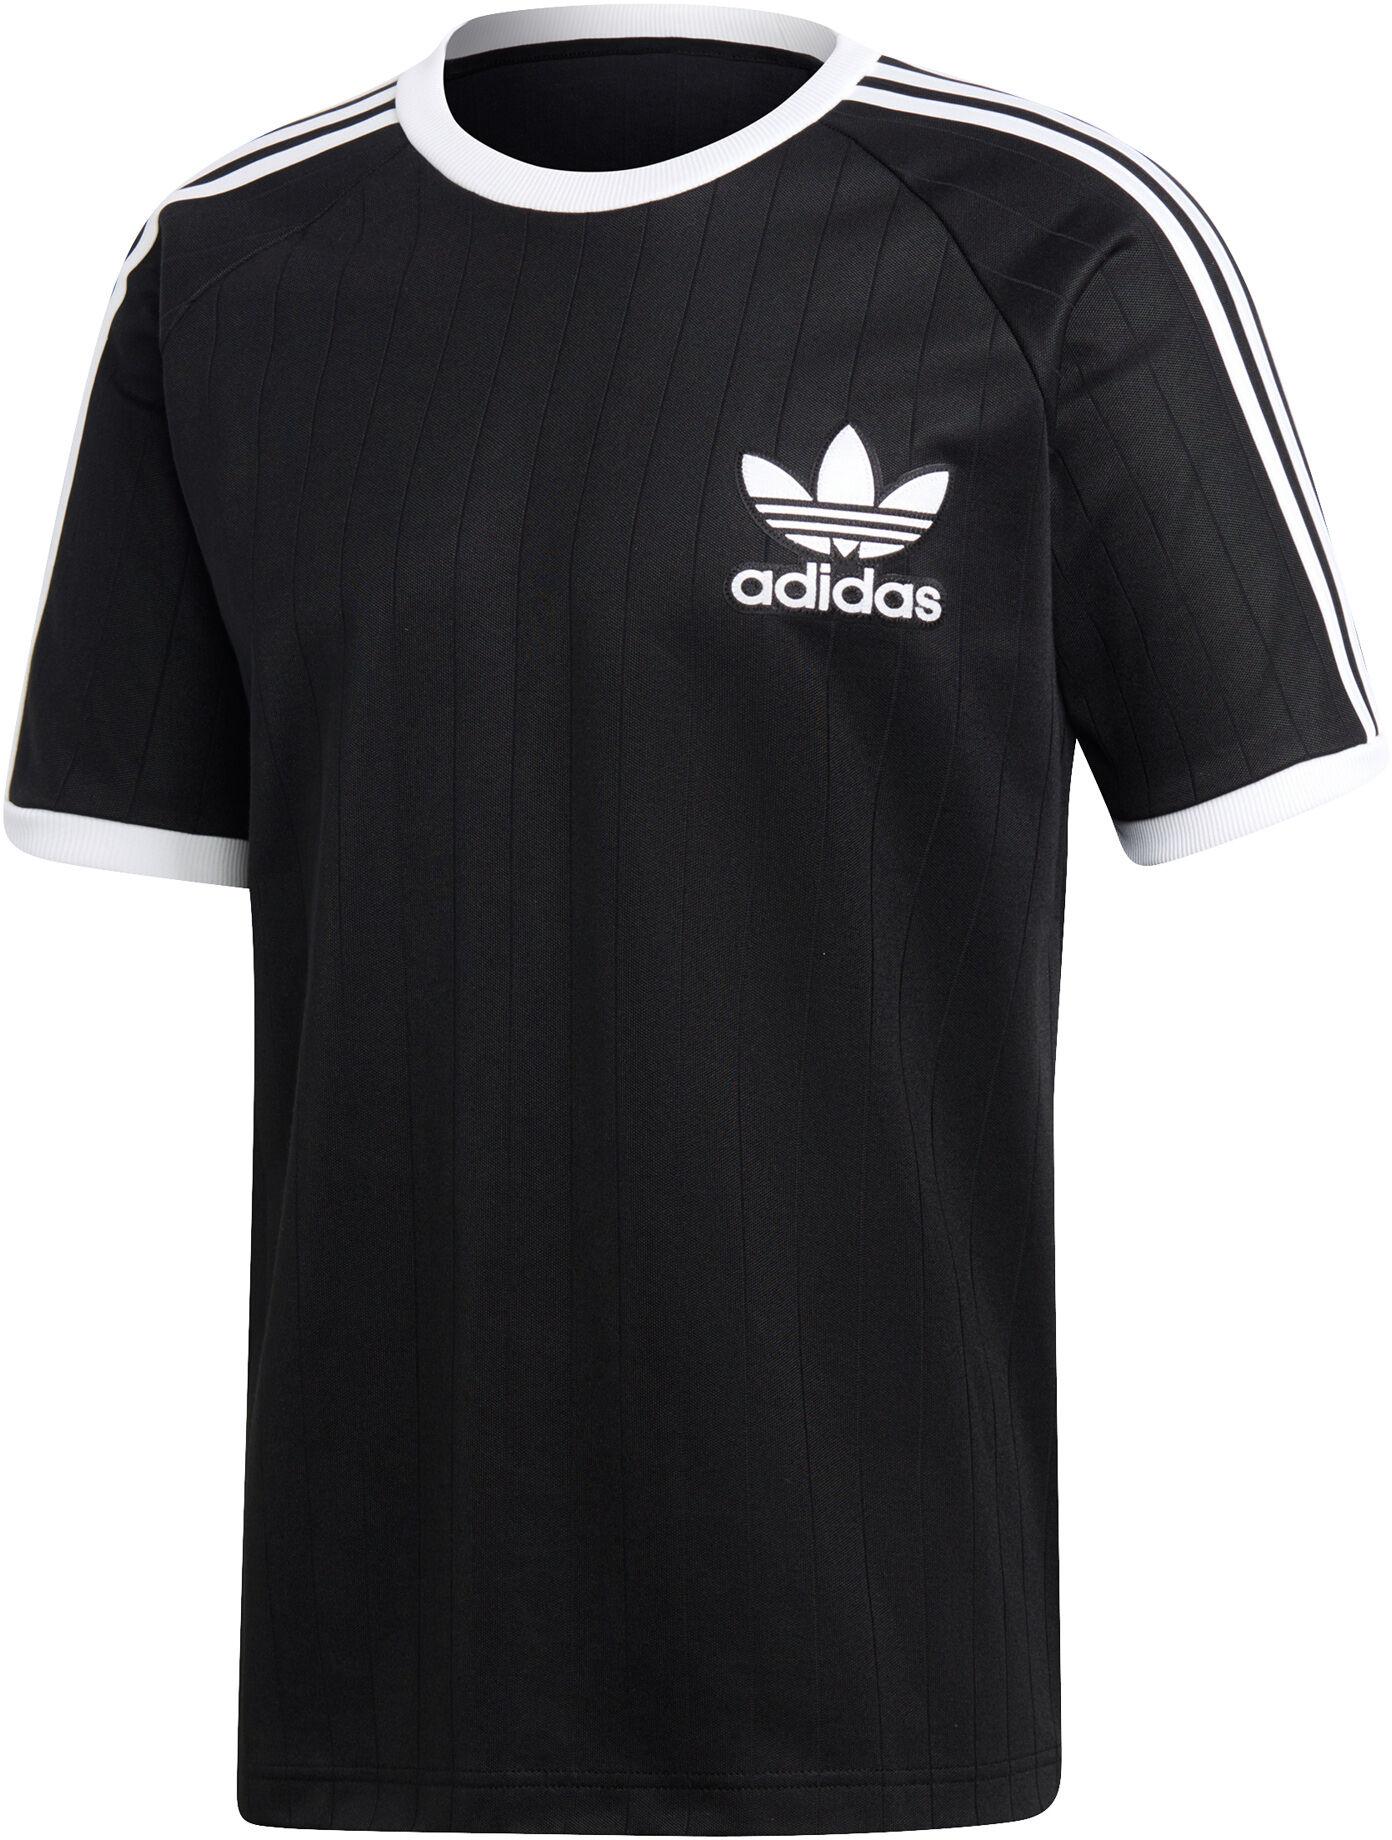 adidas baseball shirt zwart